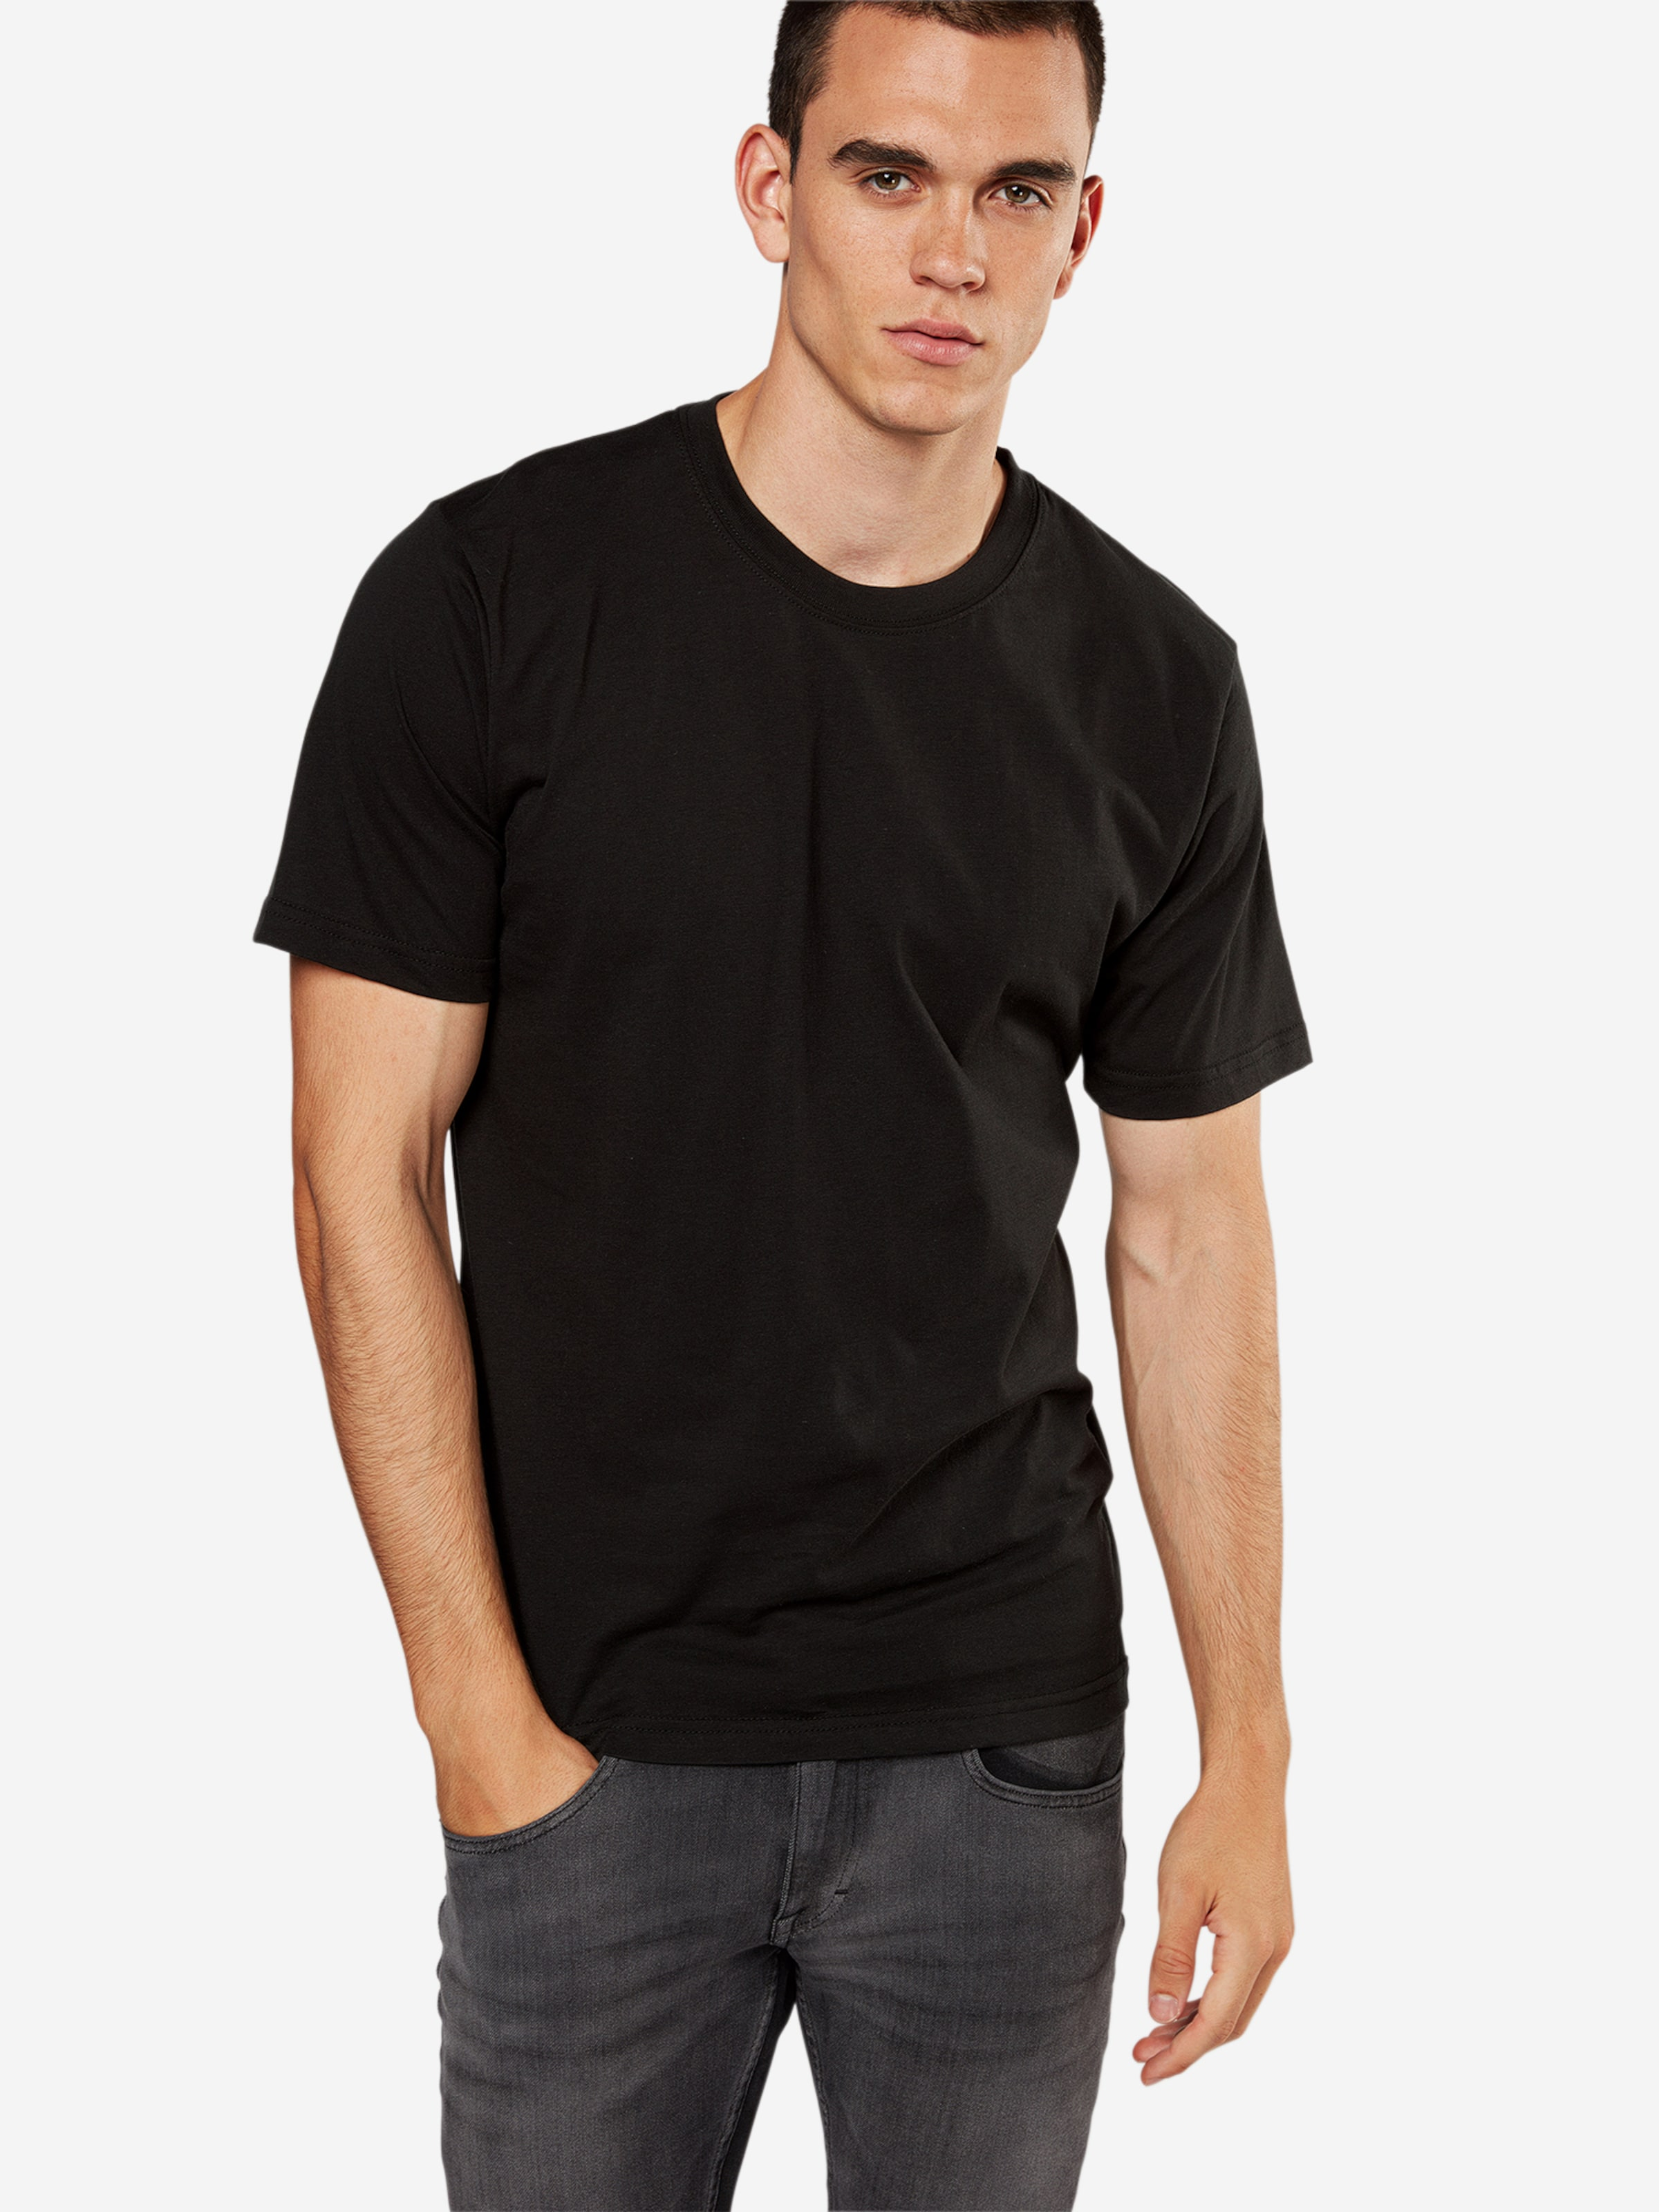 In Dickies Basic GrauSchwarz Weiß shirts rdxCoBe